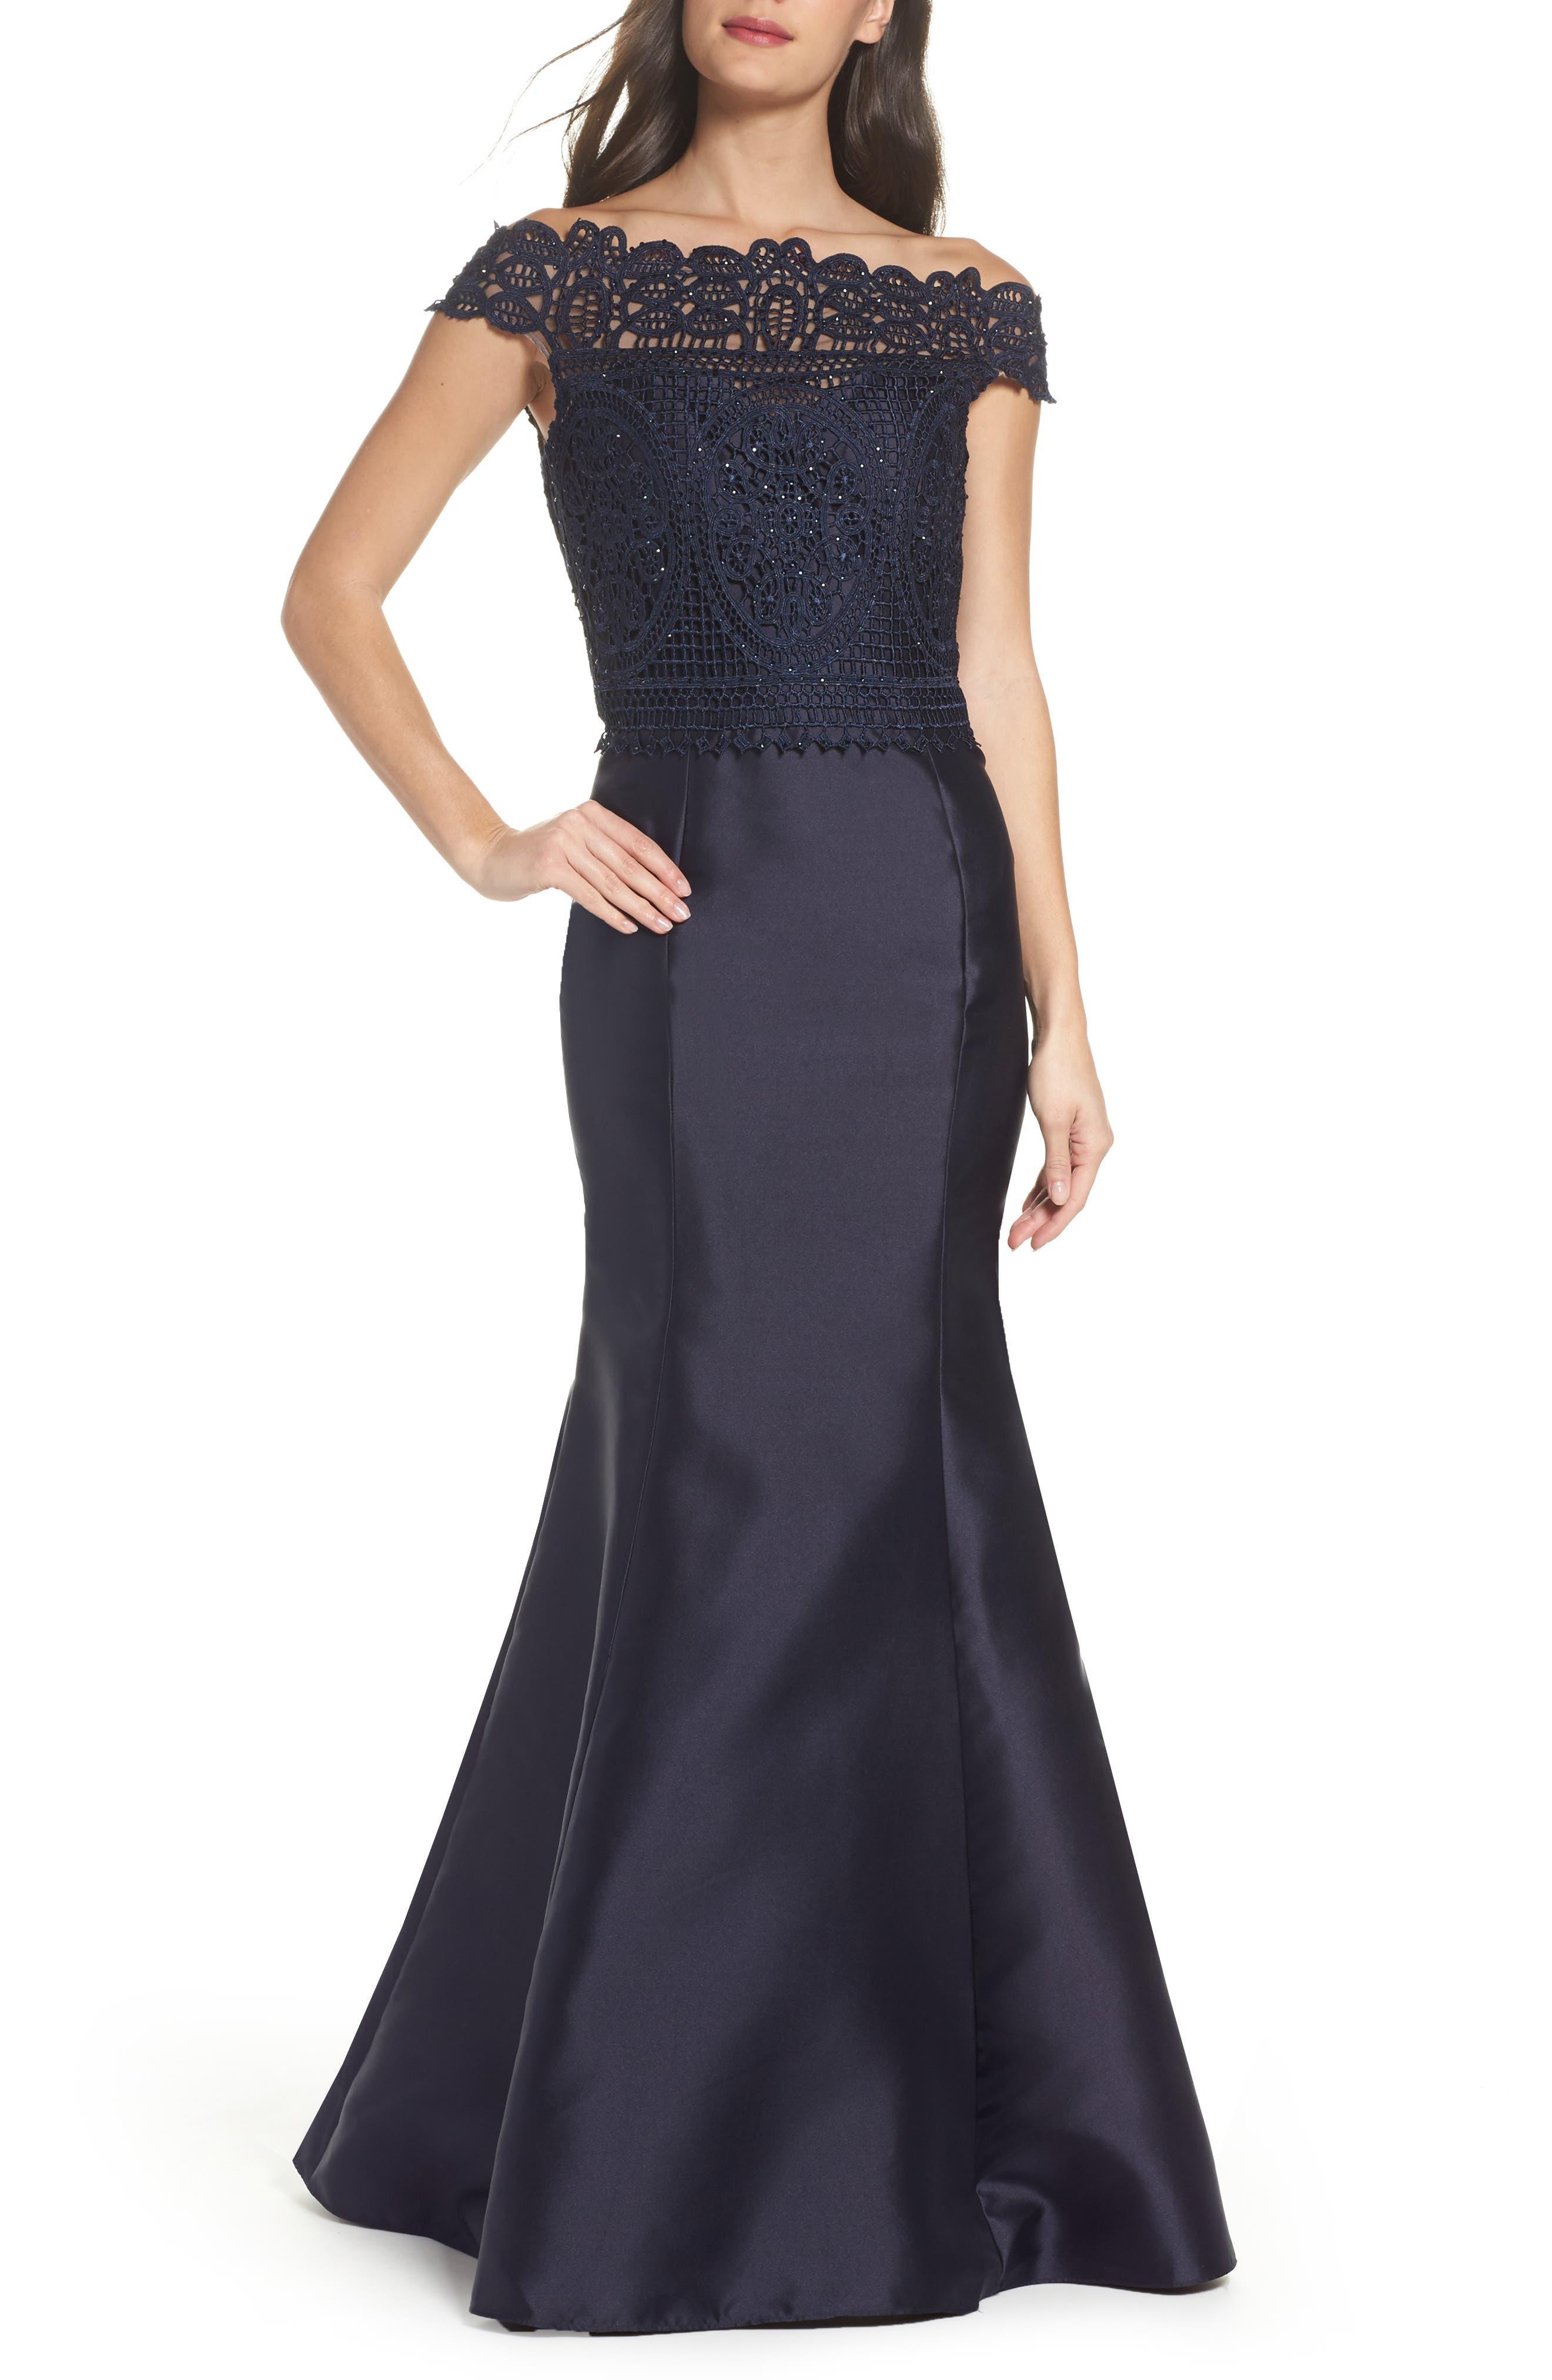 LA FEMME Lace & Twill Mermaid Gown, Main, color, 410